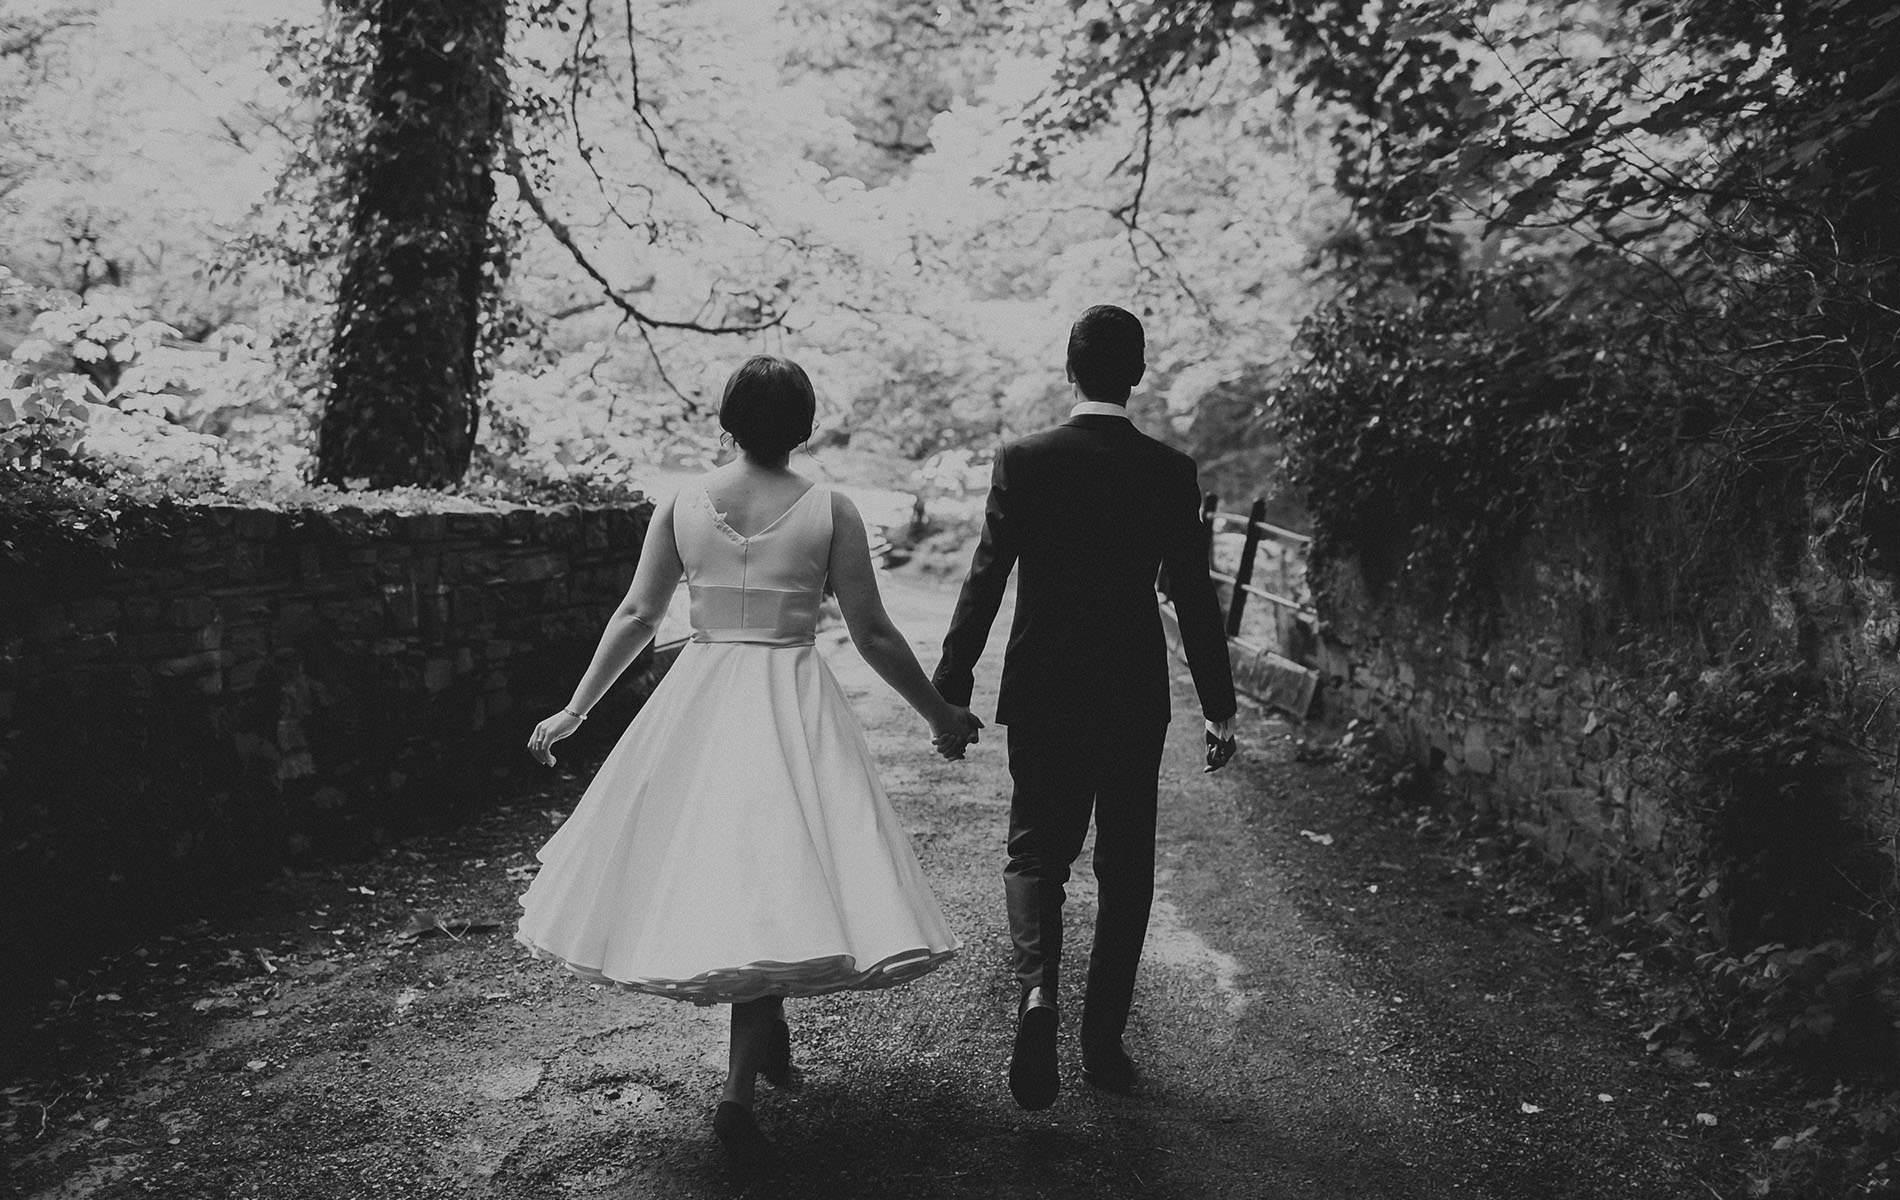 Wedding photographer cornwall Booking